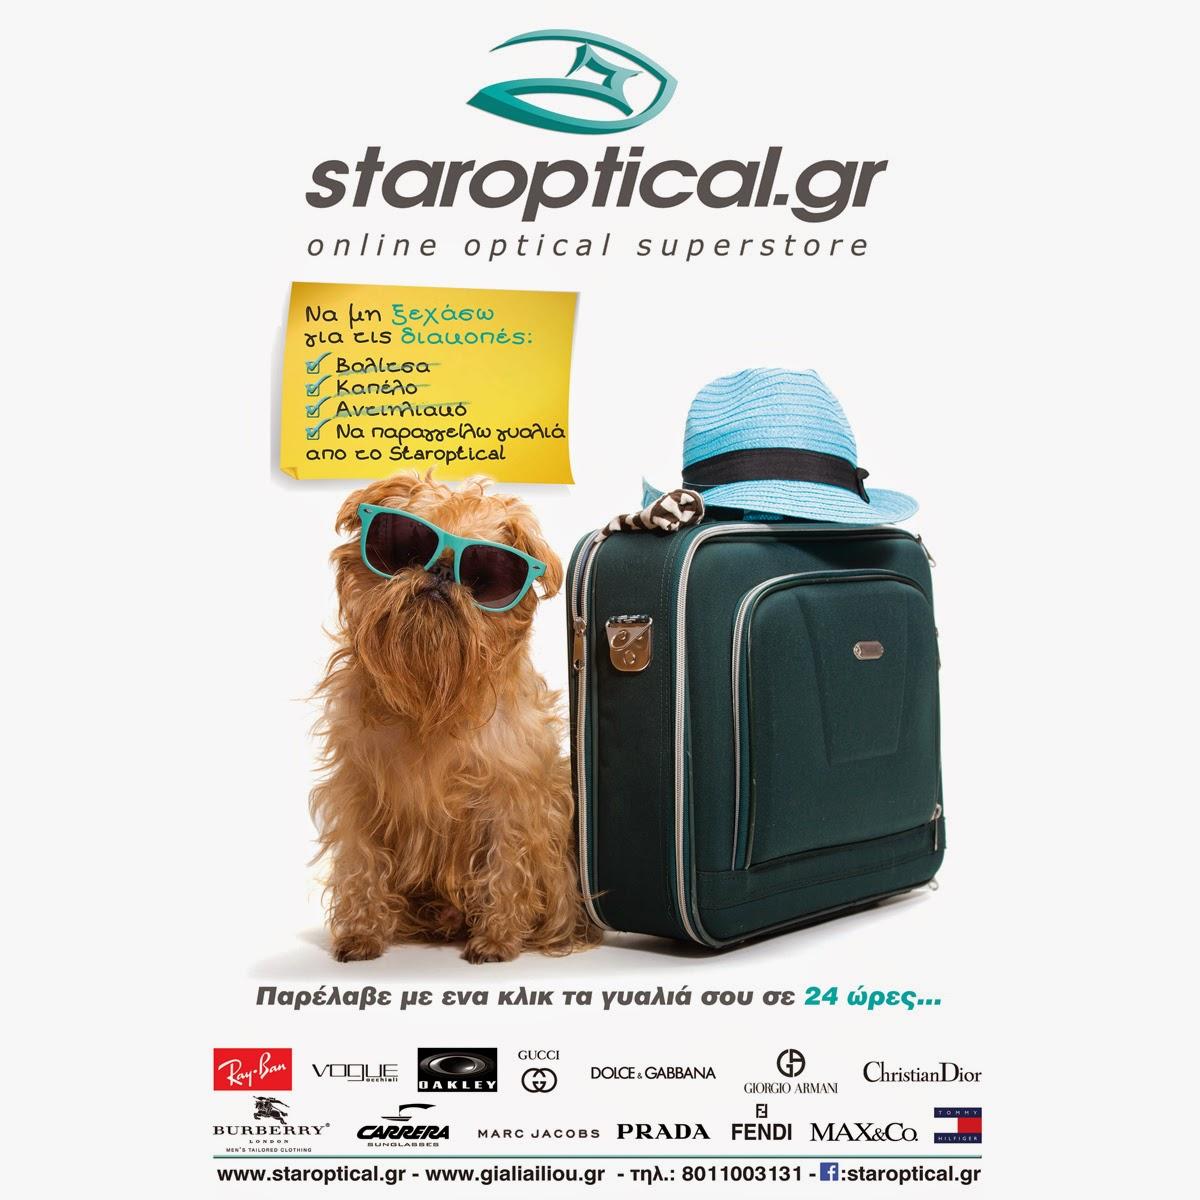 staroptical.gr blog - Γυαλιά Ηλίου - Γυαλιά Οράσεως - Φακοί Επαφής 548f0d144c6